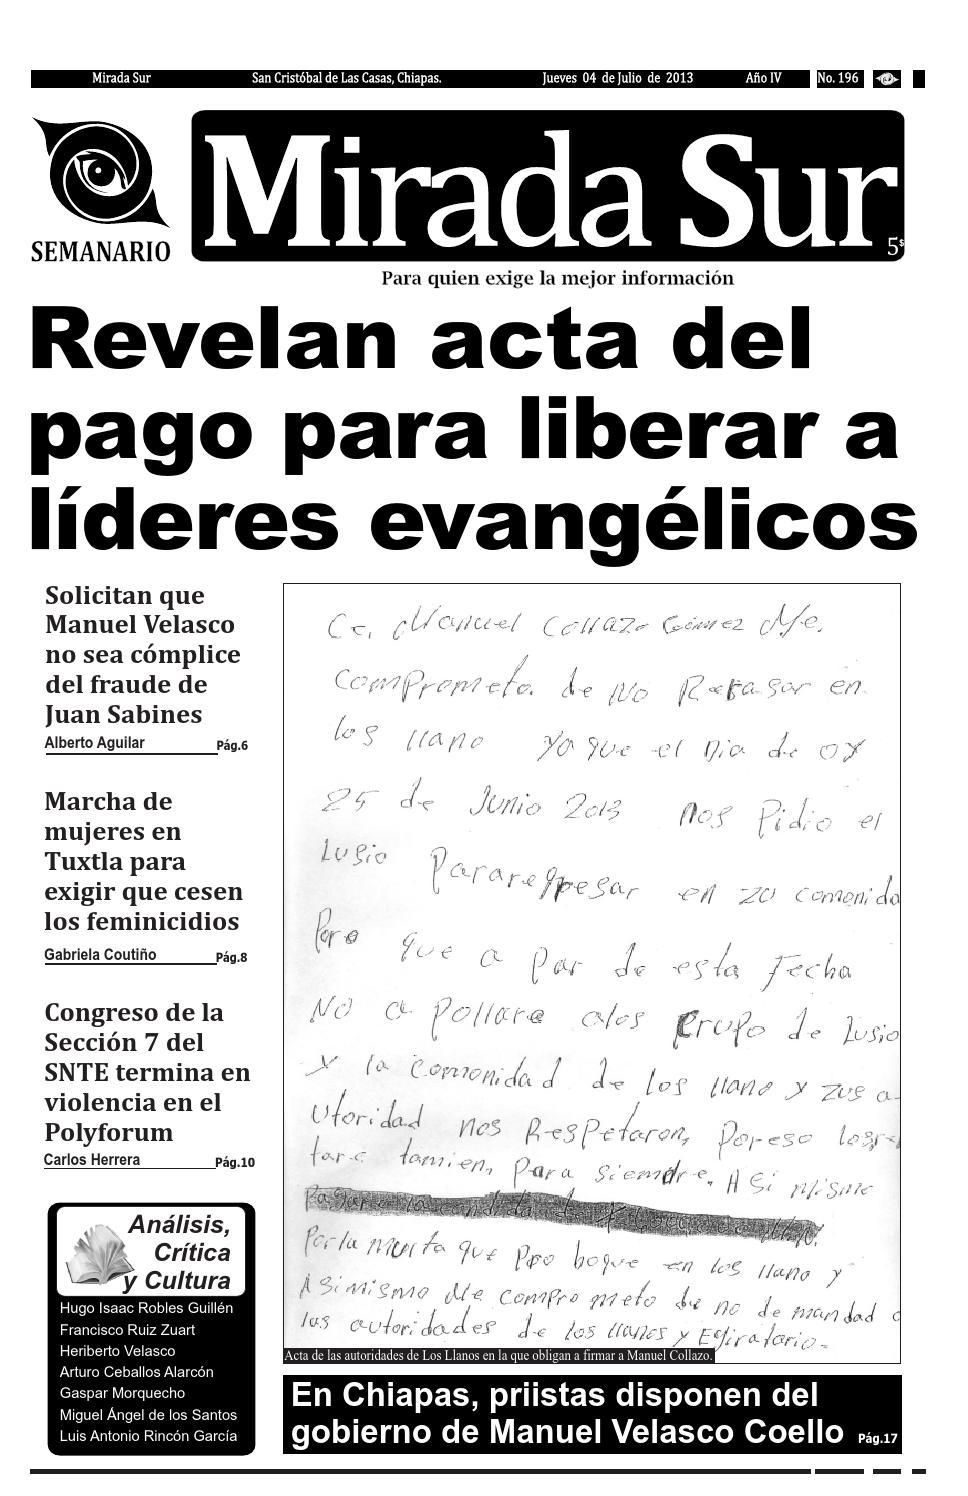 Revelan acta del pago para liberar a líderes evangélicos